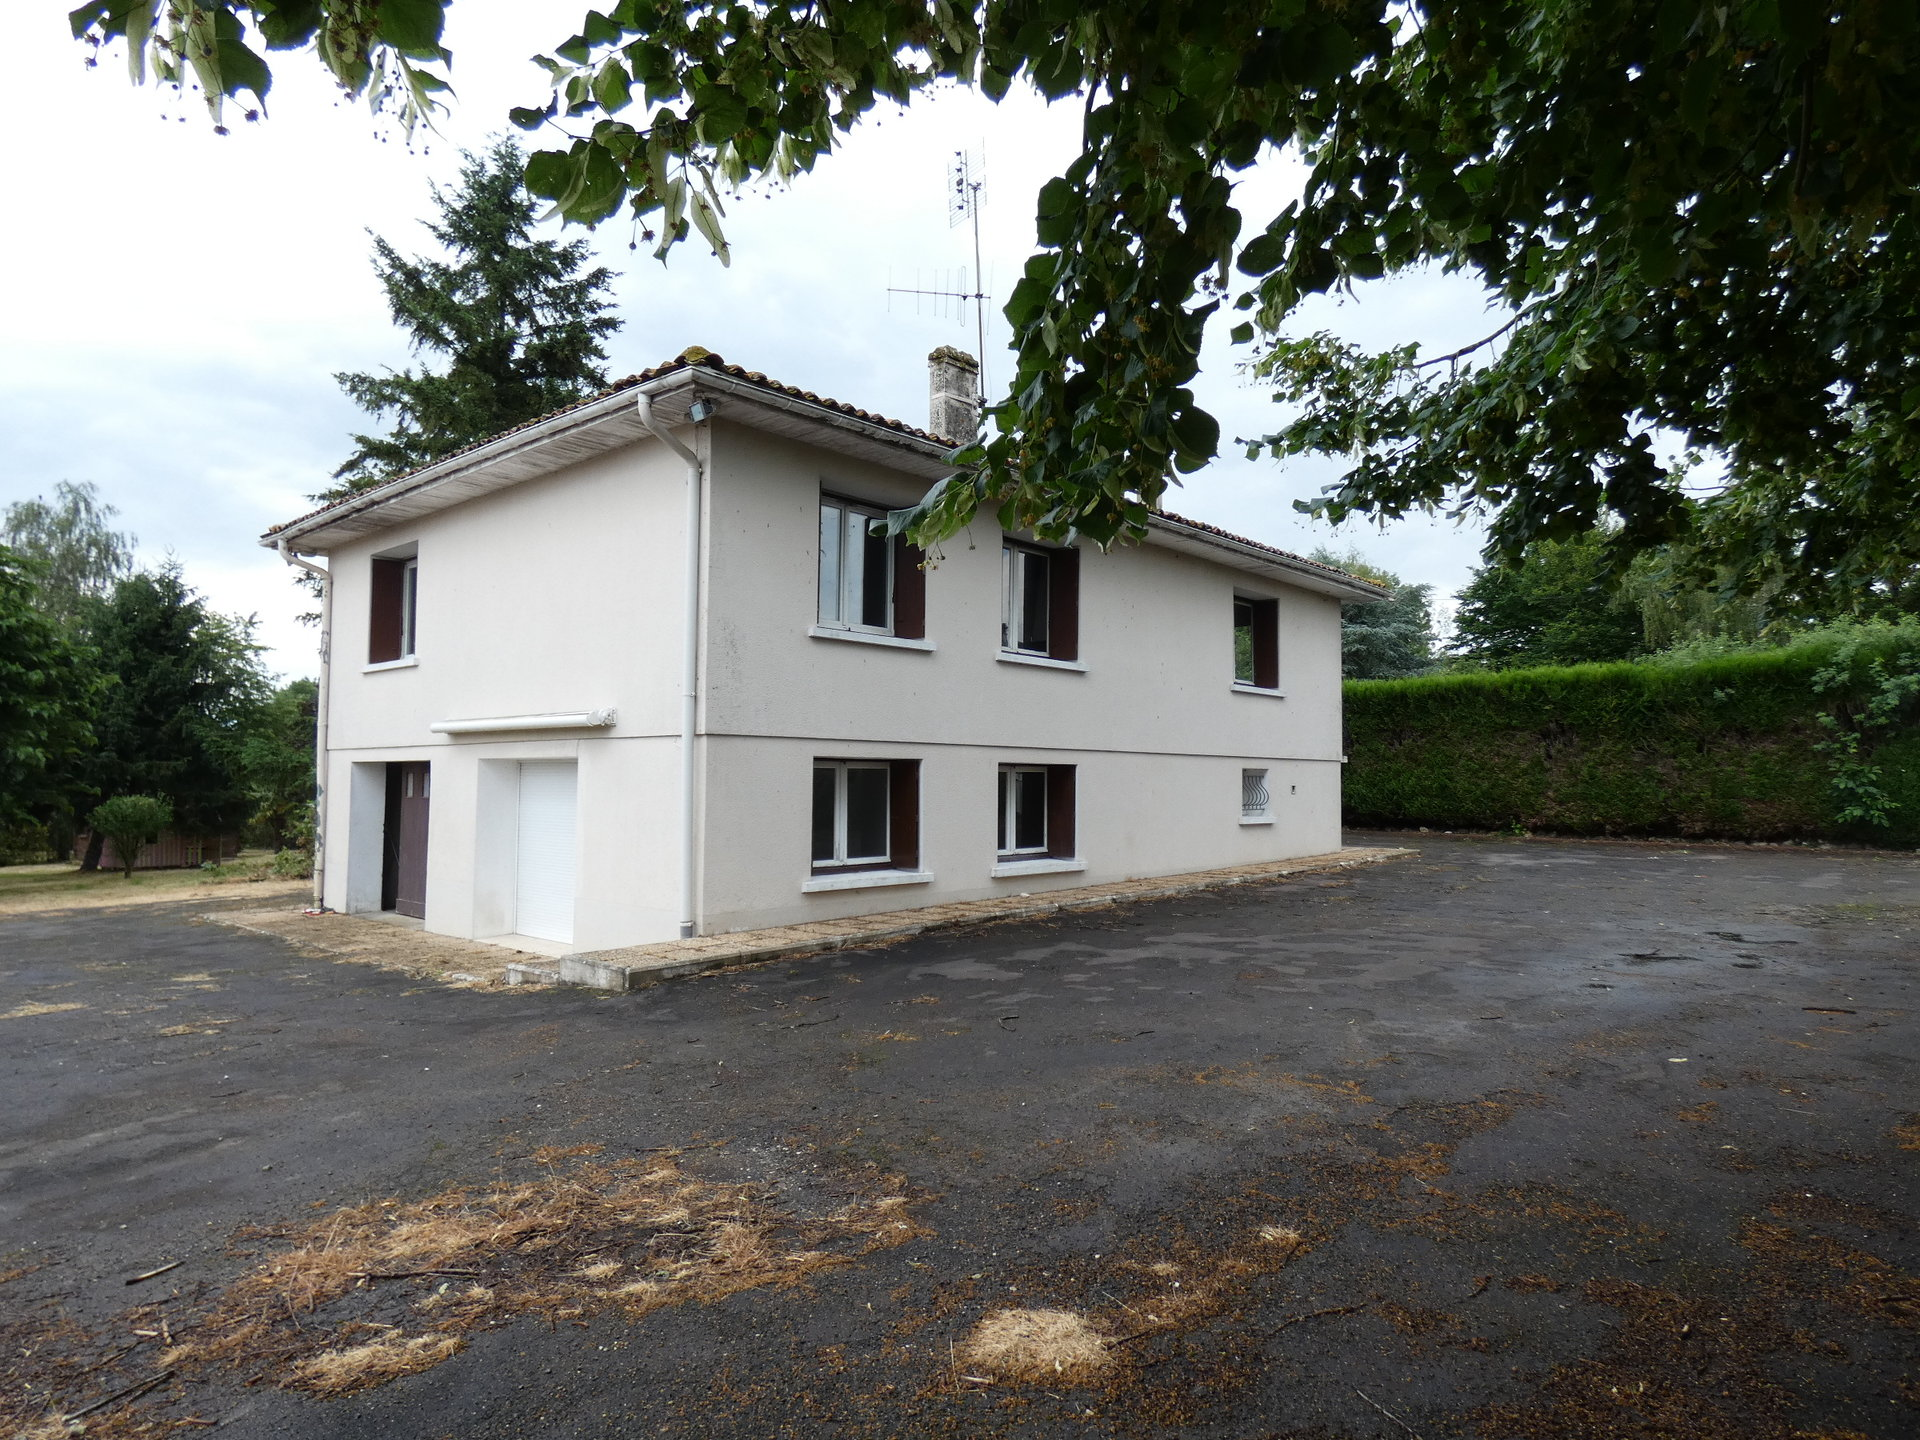 house on basement in Mansle